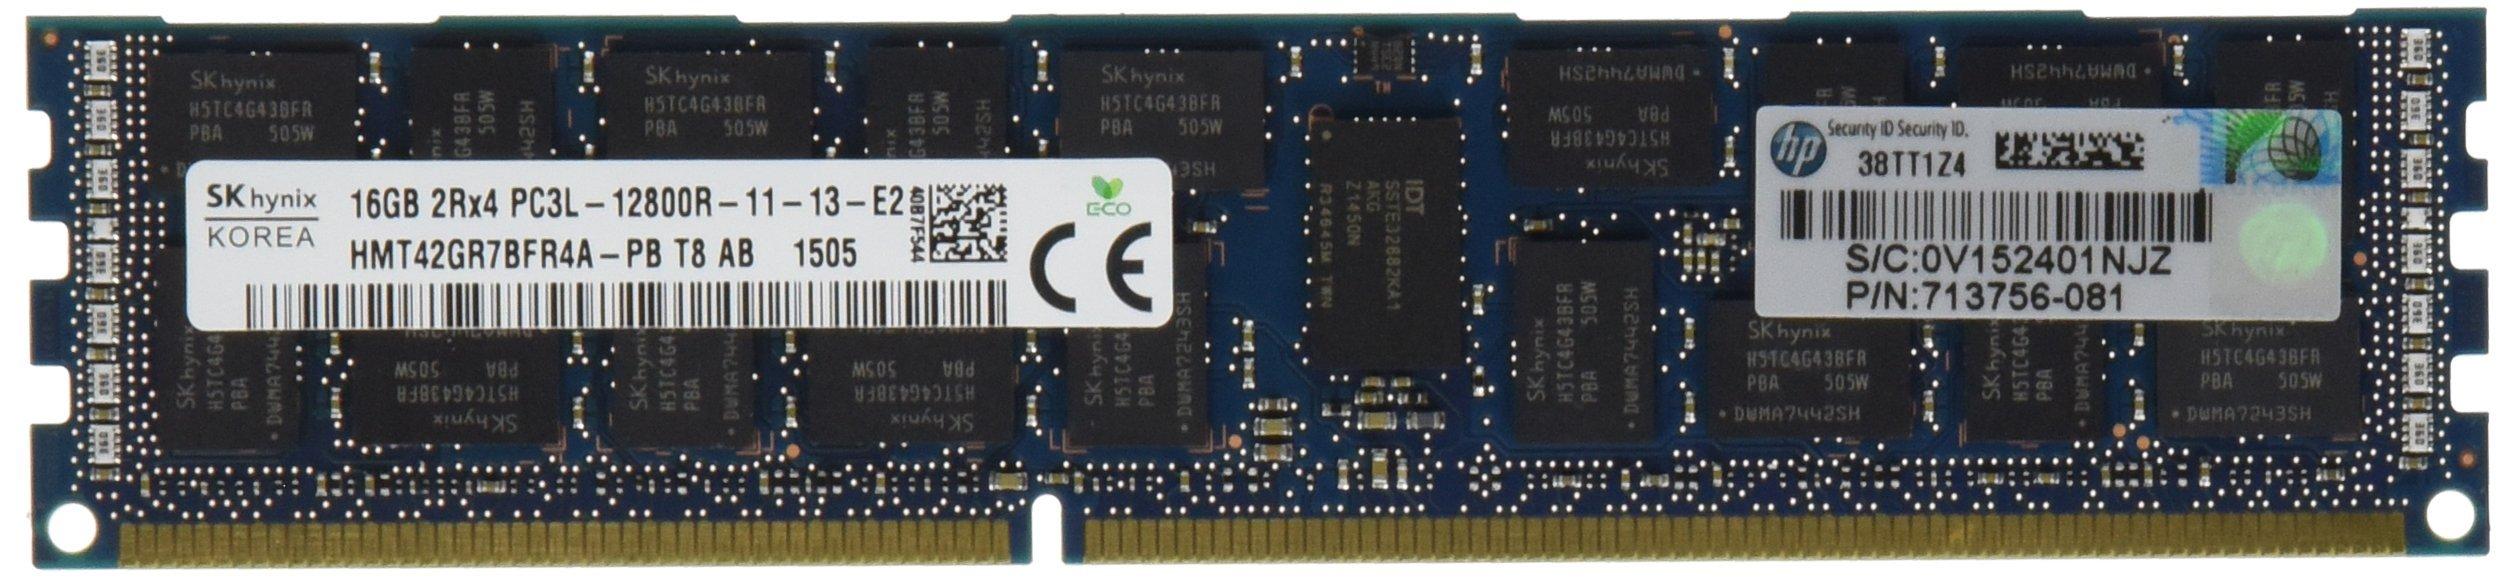 HP 16GB (1X16GB) 2RX4 PC3L-12800R DDR3-1600-MHZ MEMORY KIT Server Memory 713985-B21 (Certified Refurbished)